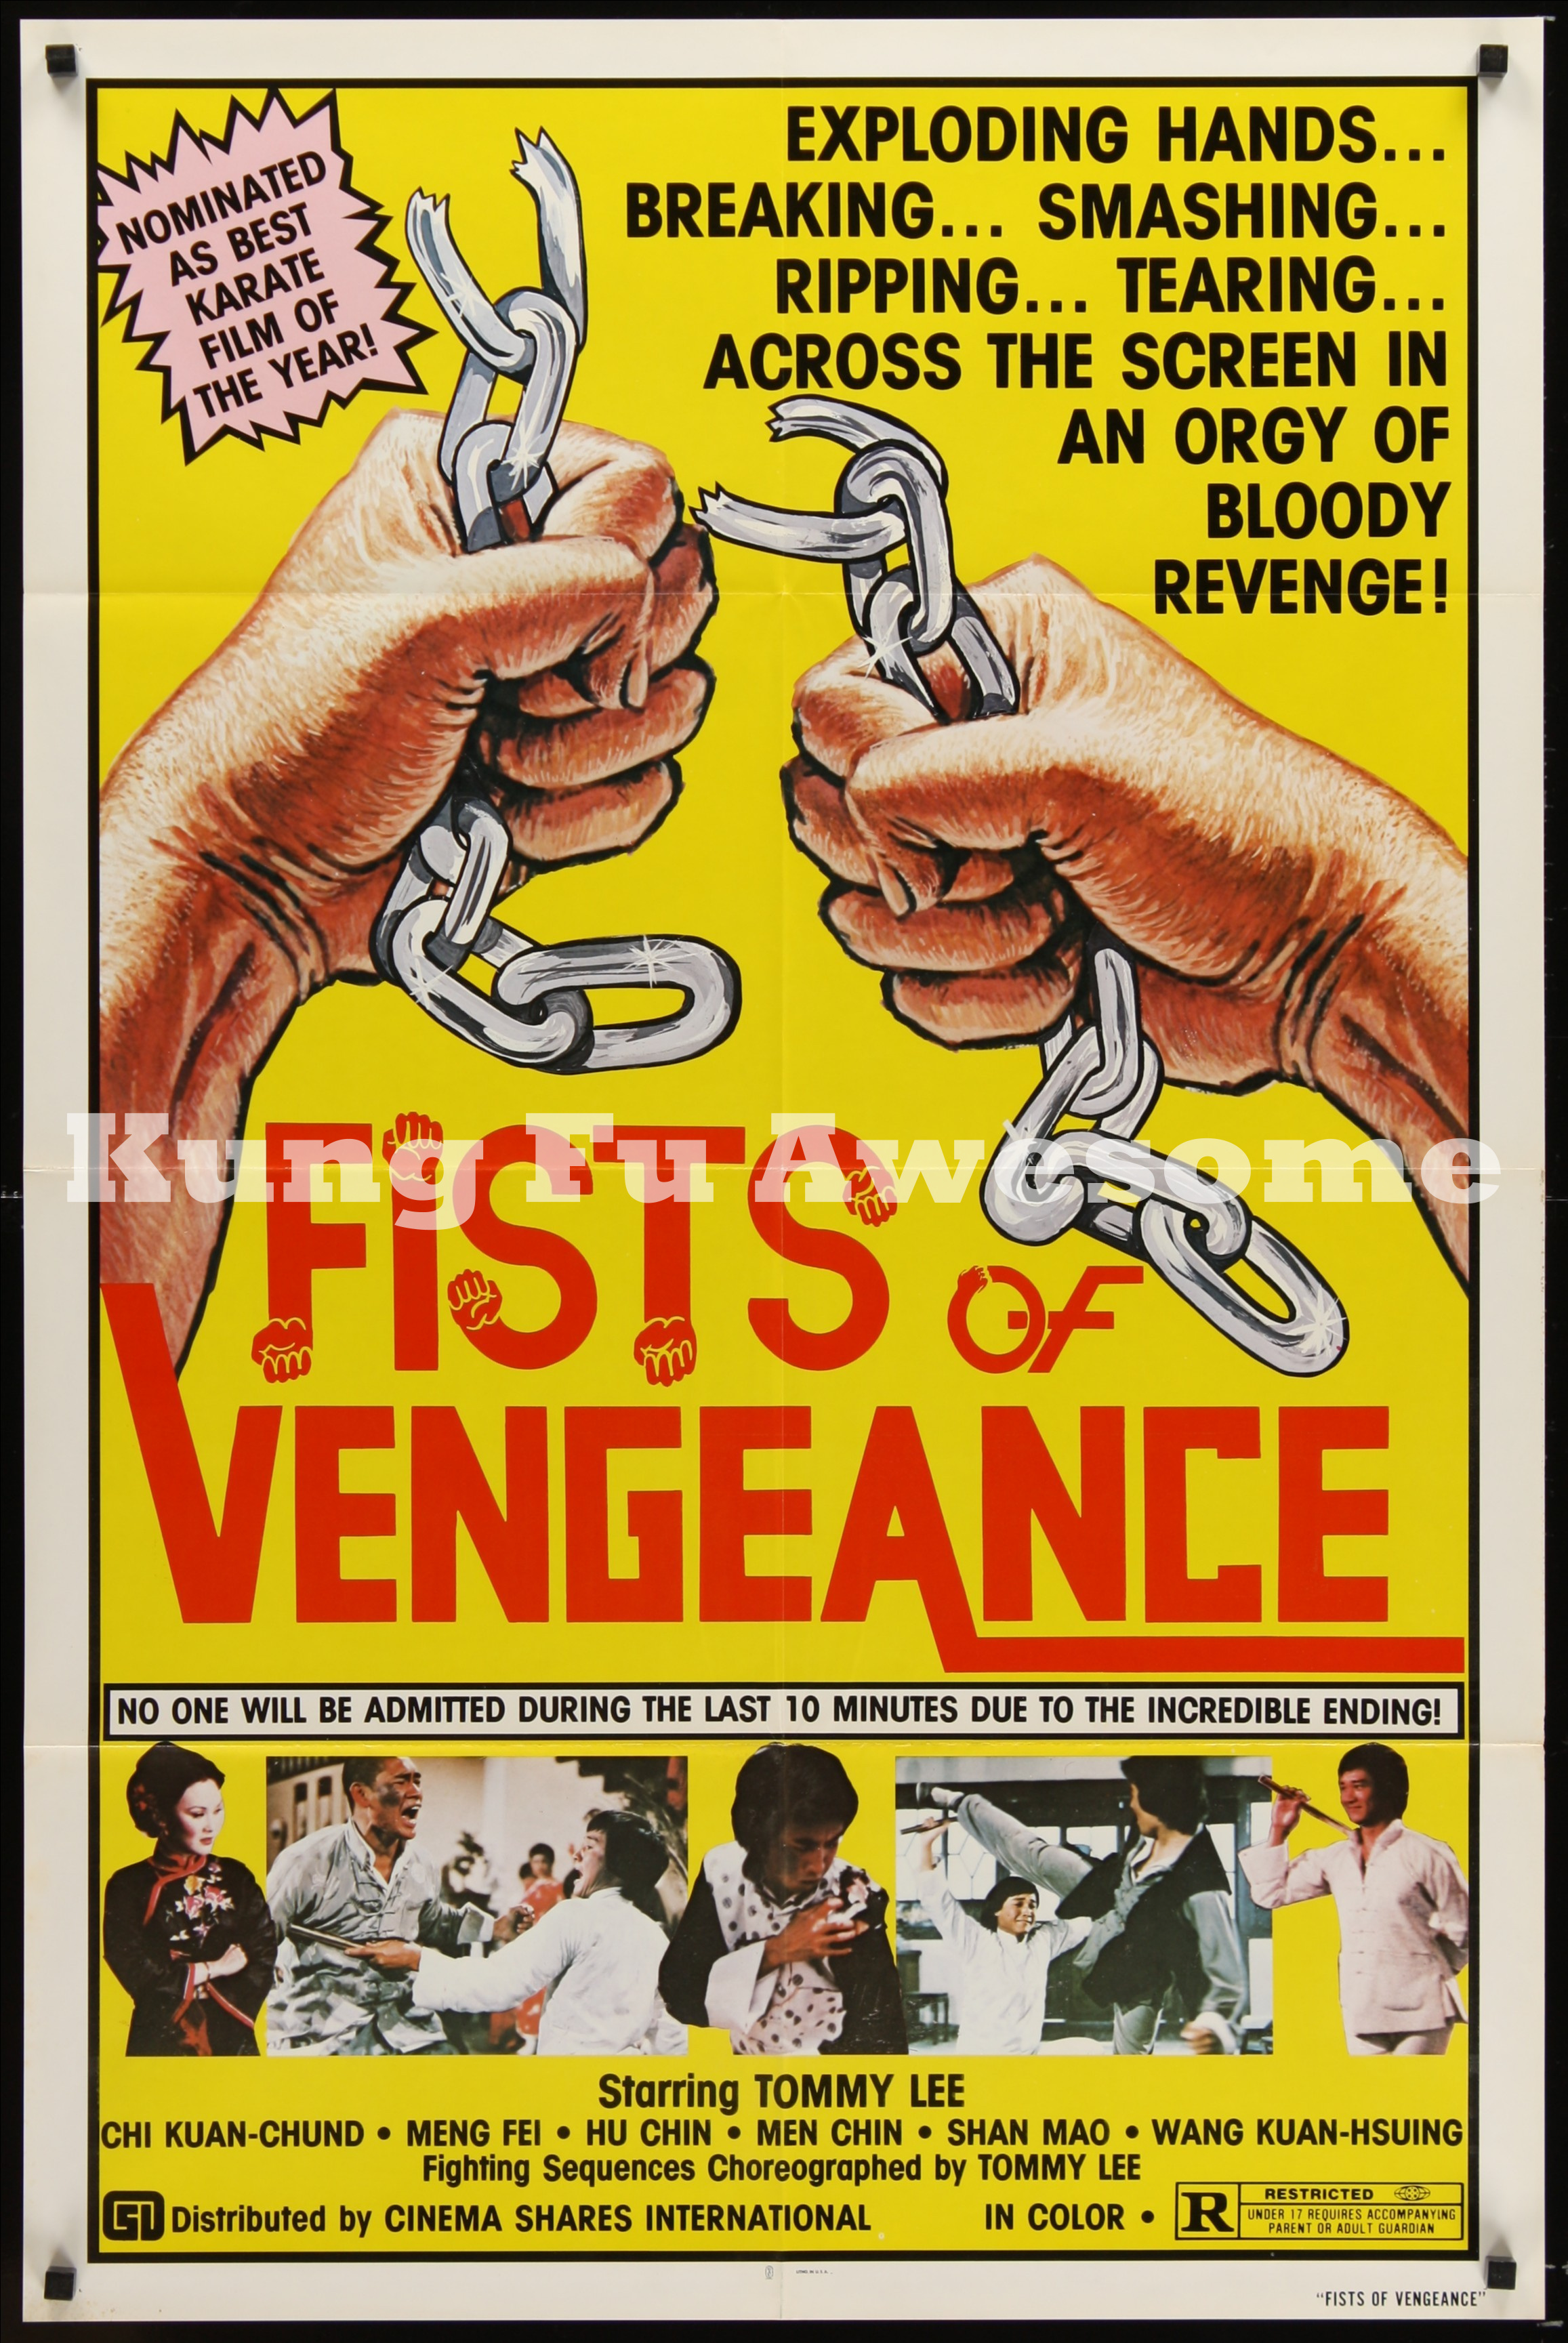 fists_of_vengeance_NZ03181_L.jpg